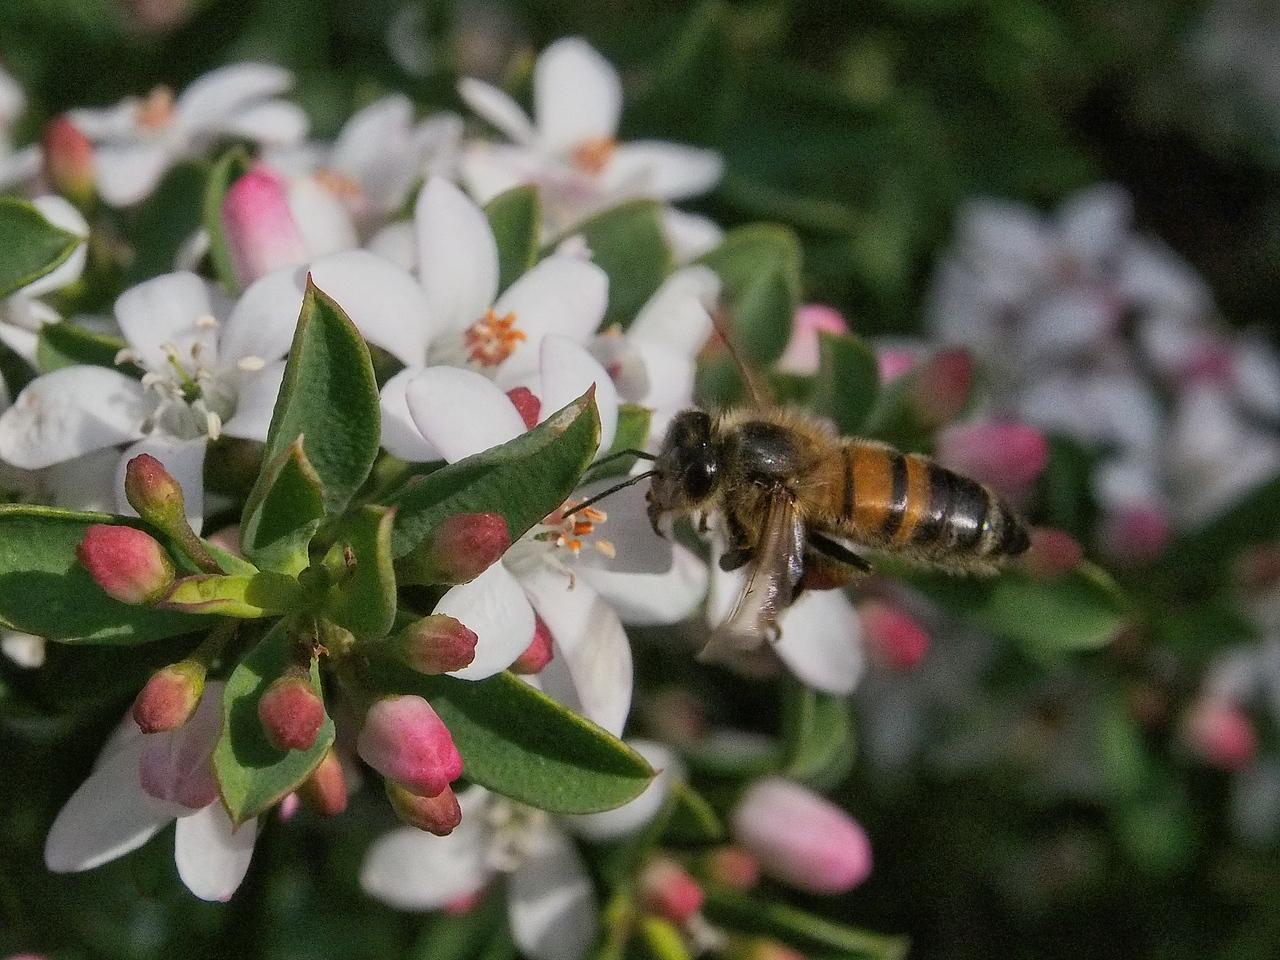 20130901_1218_1720 Kew Baptist bee